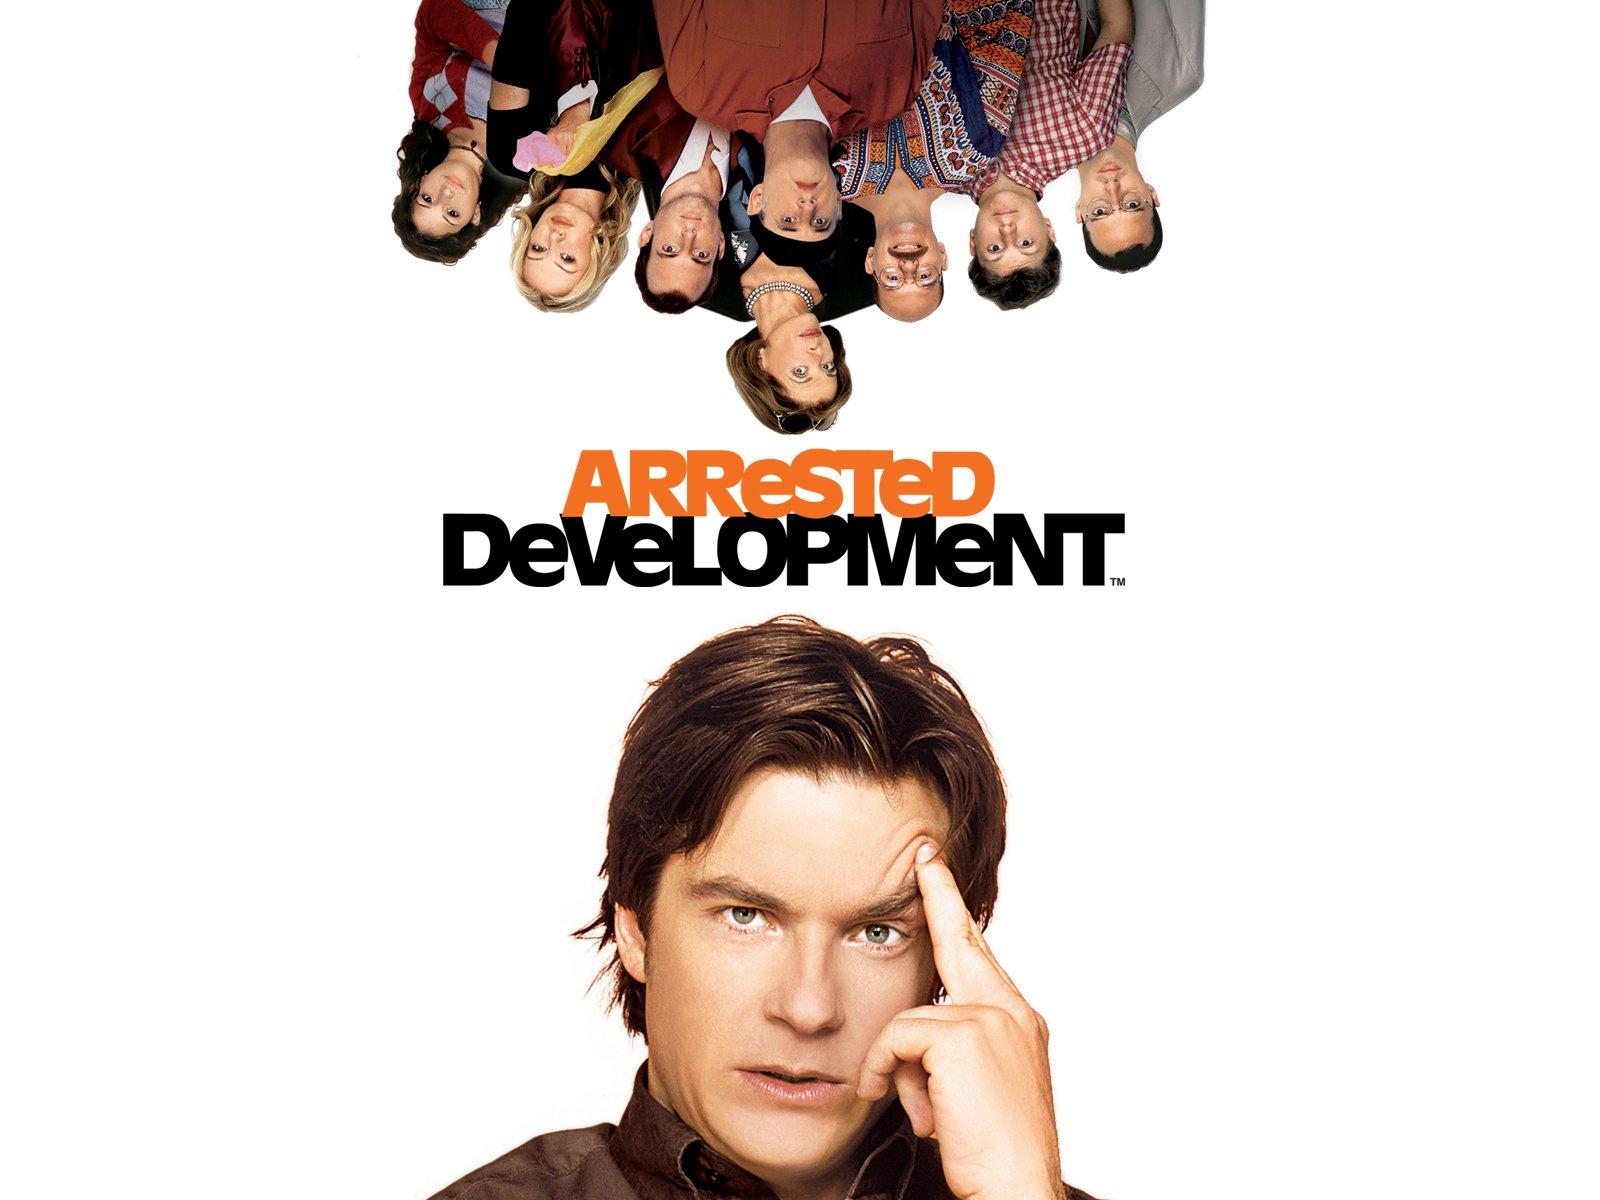 Amazon arrested development season 1 amazon digital services llc bookmarktalkfo Image collections